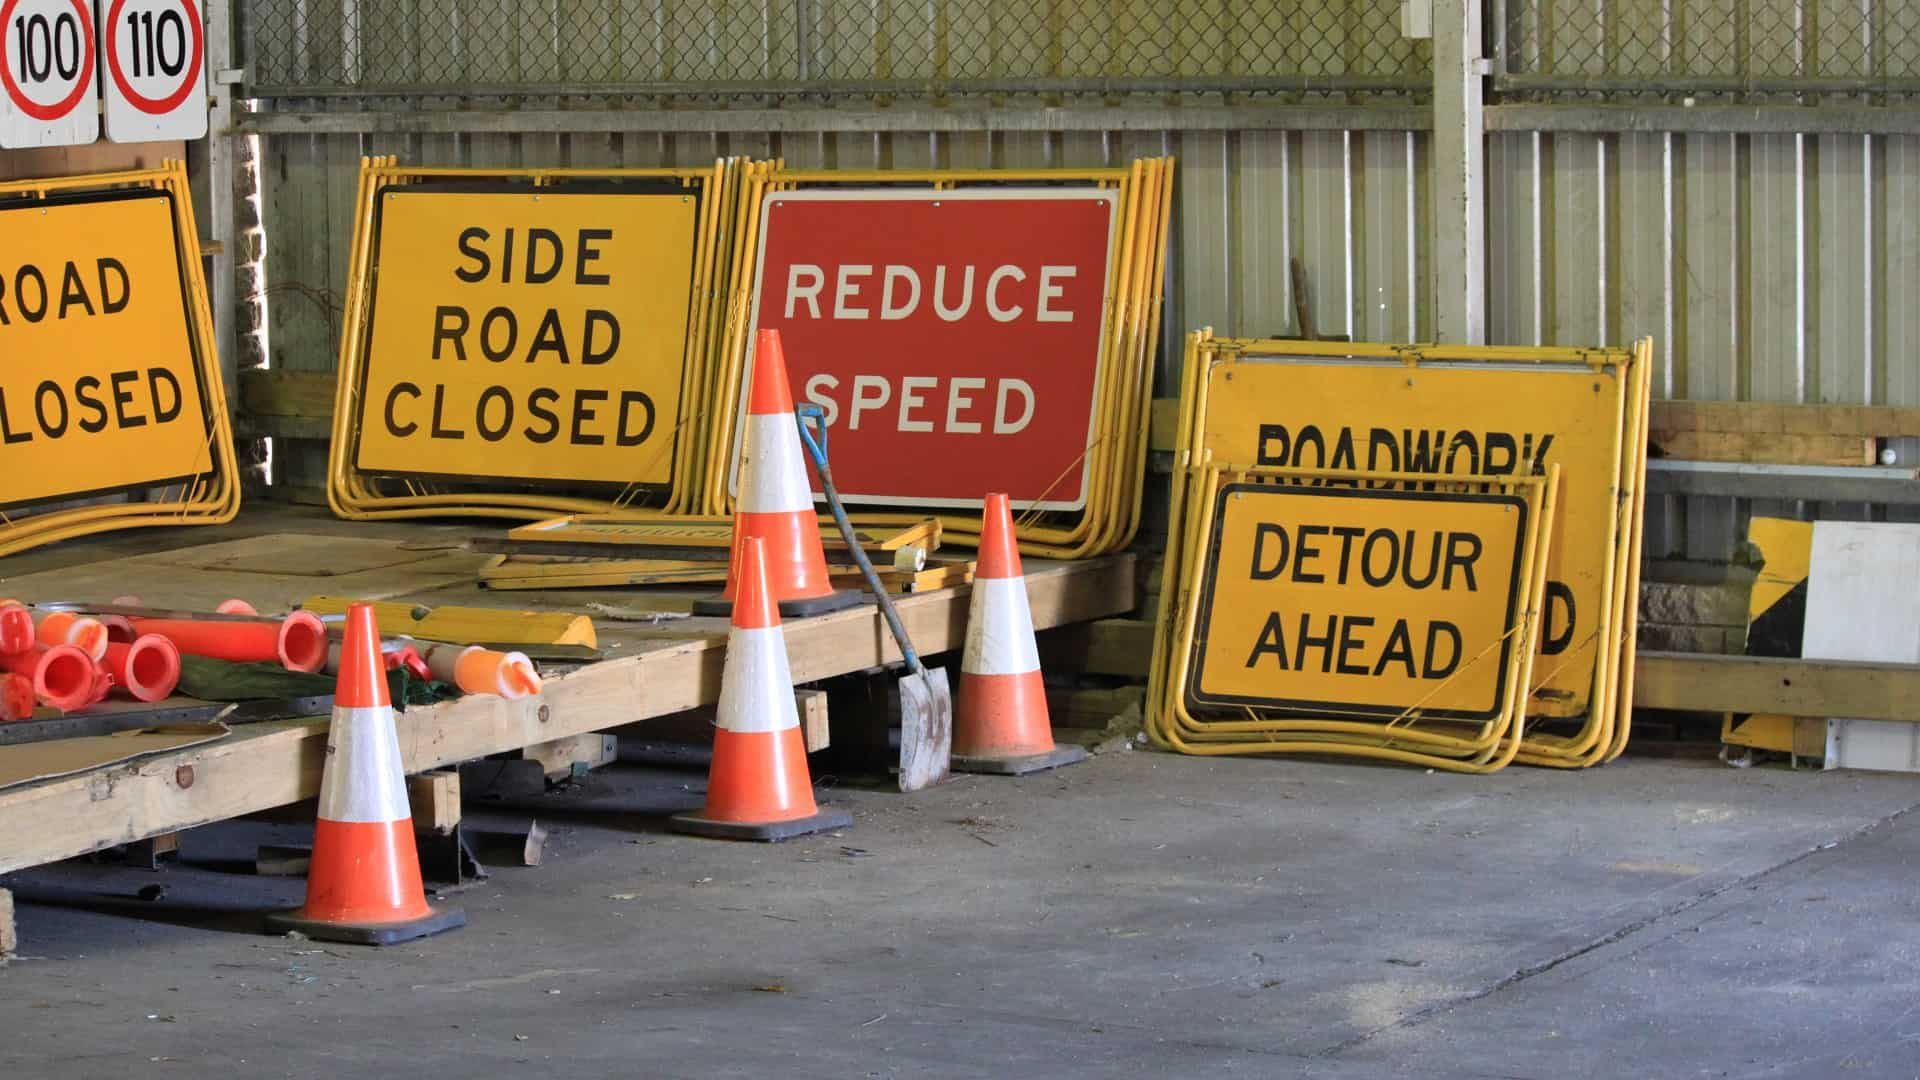 Traffic Control Signage and equipment